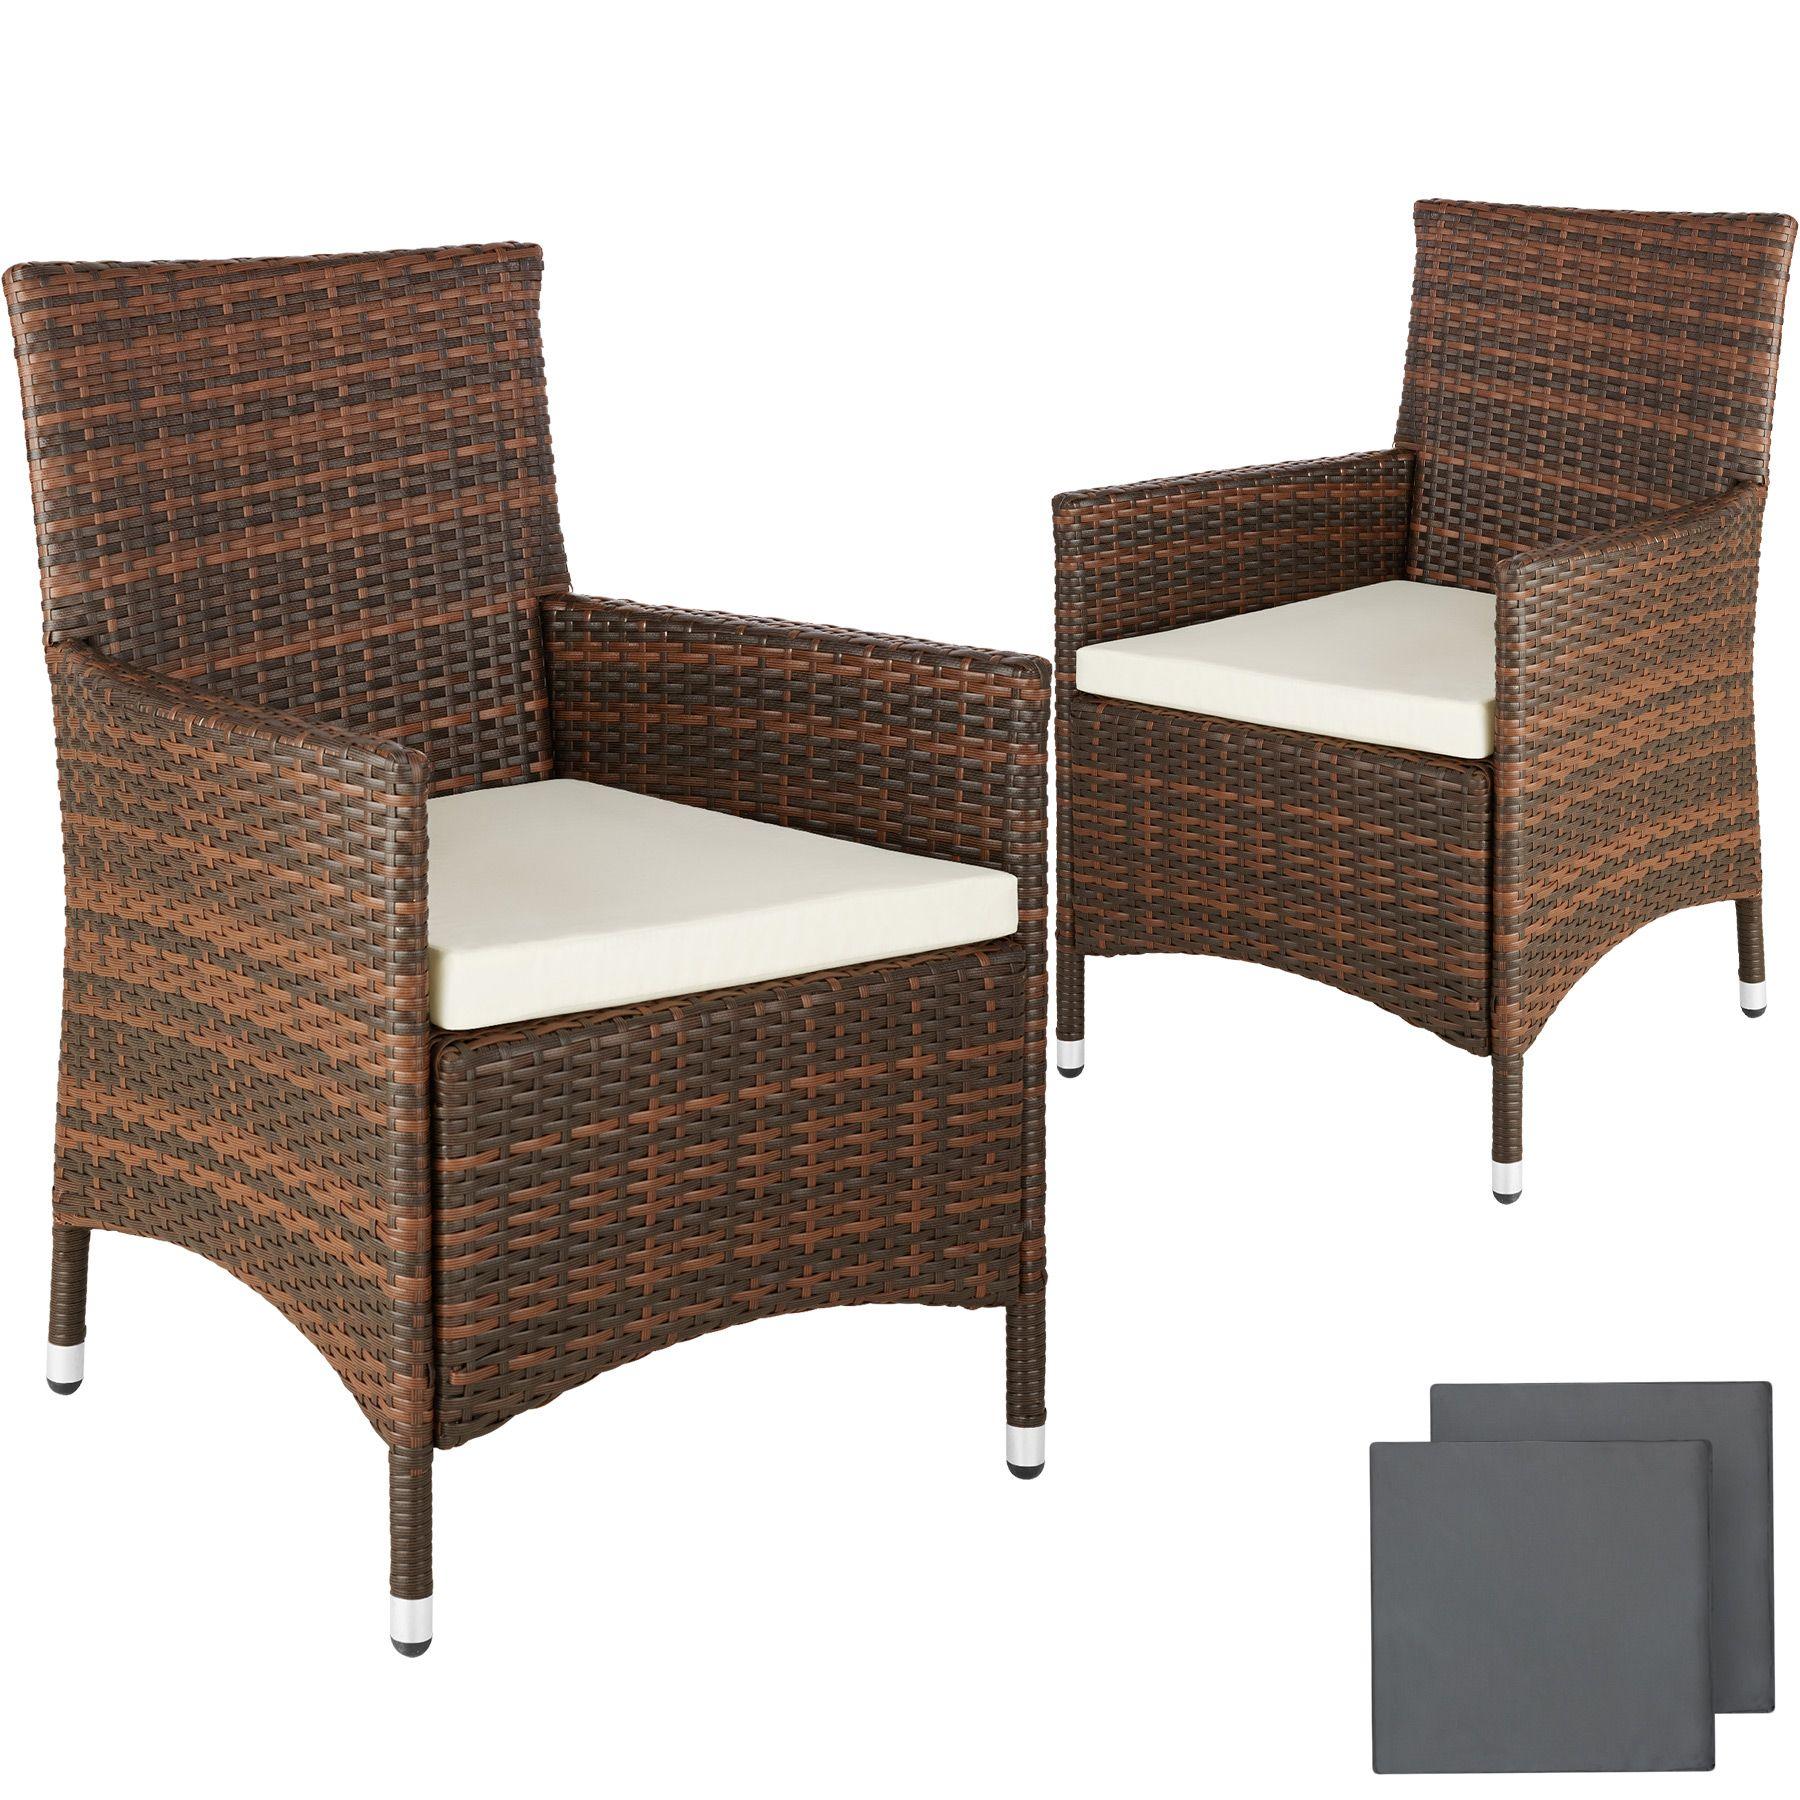 Set Giardino In Rattan.2 X Poly Rattan Garden Chairs Alu Wicker Outdoor Armchair Set